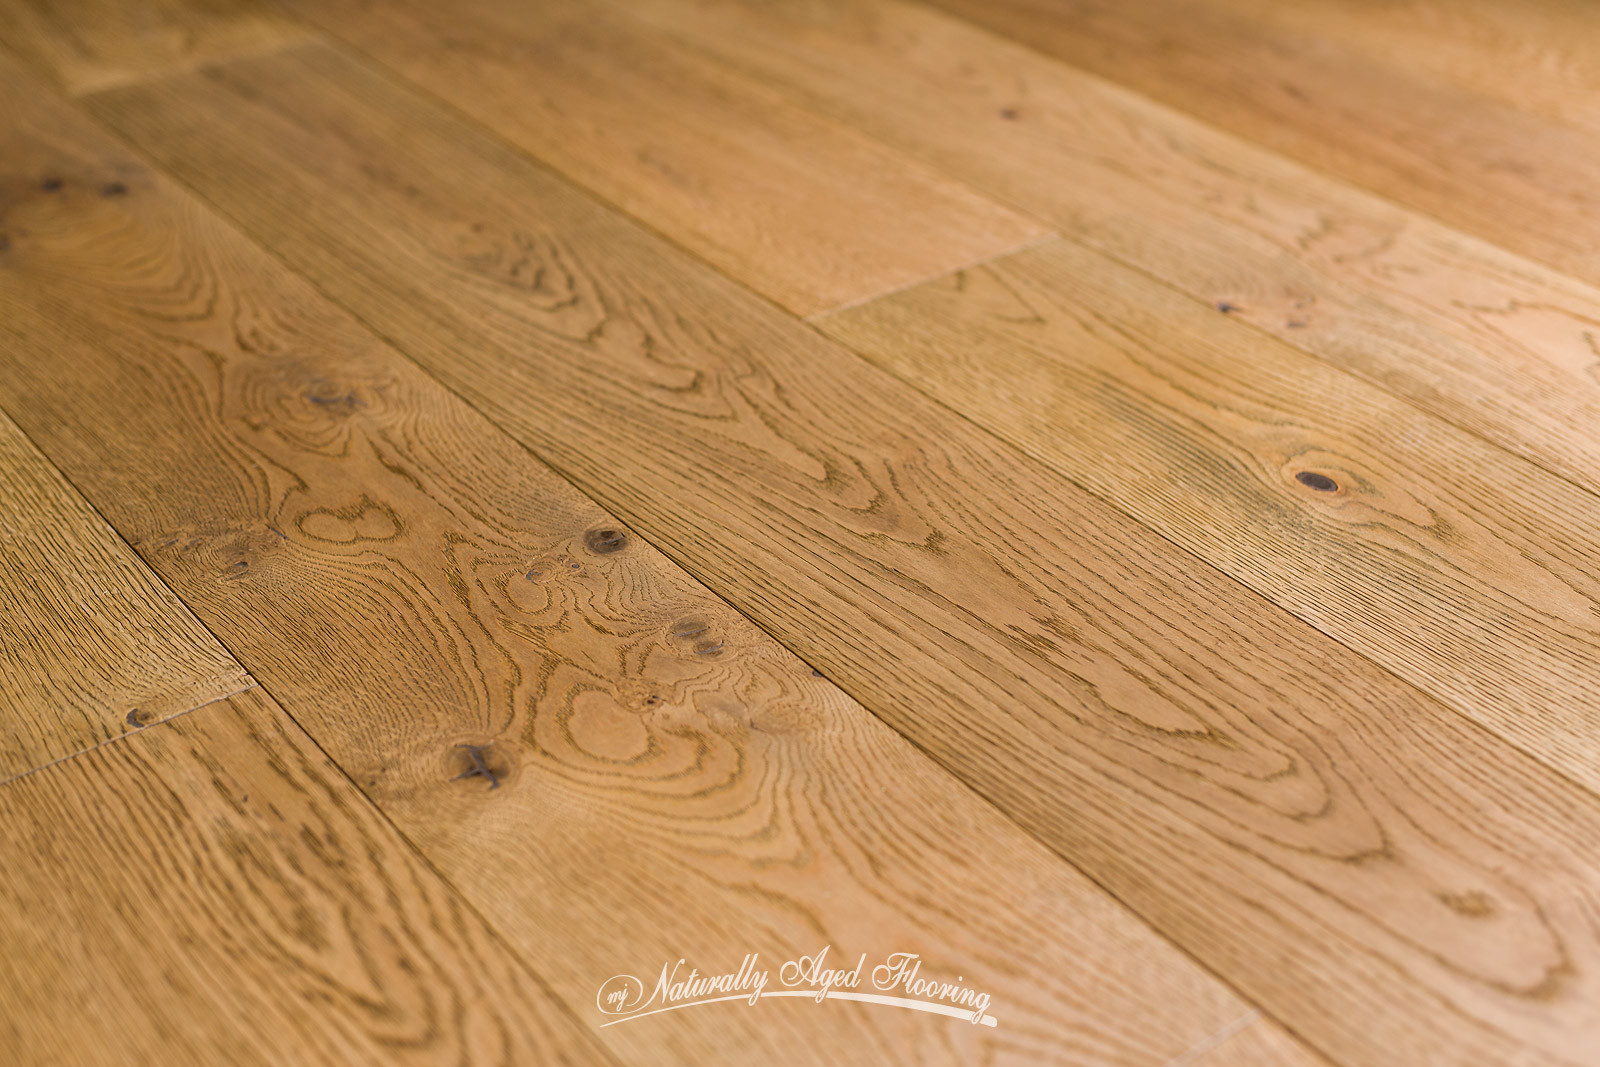 Tahoe Naturally Aged Flooring